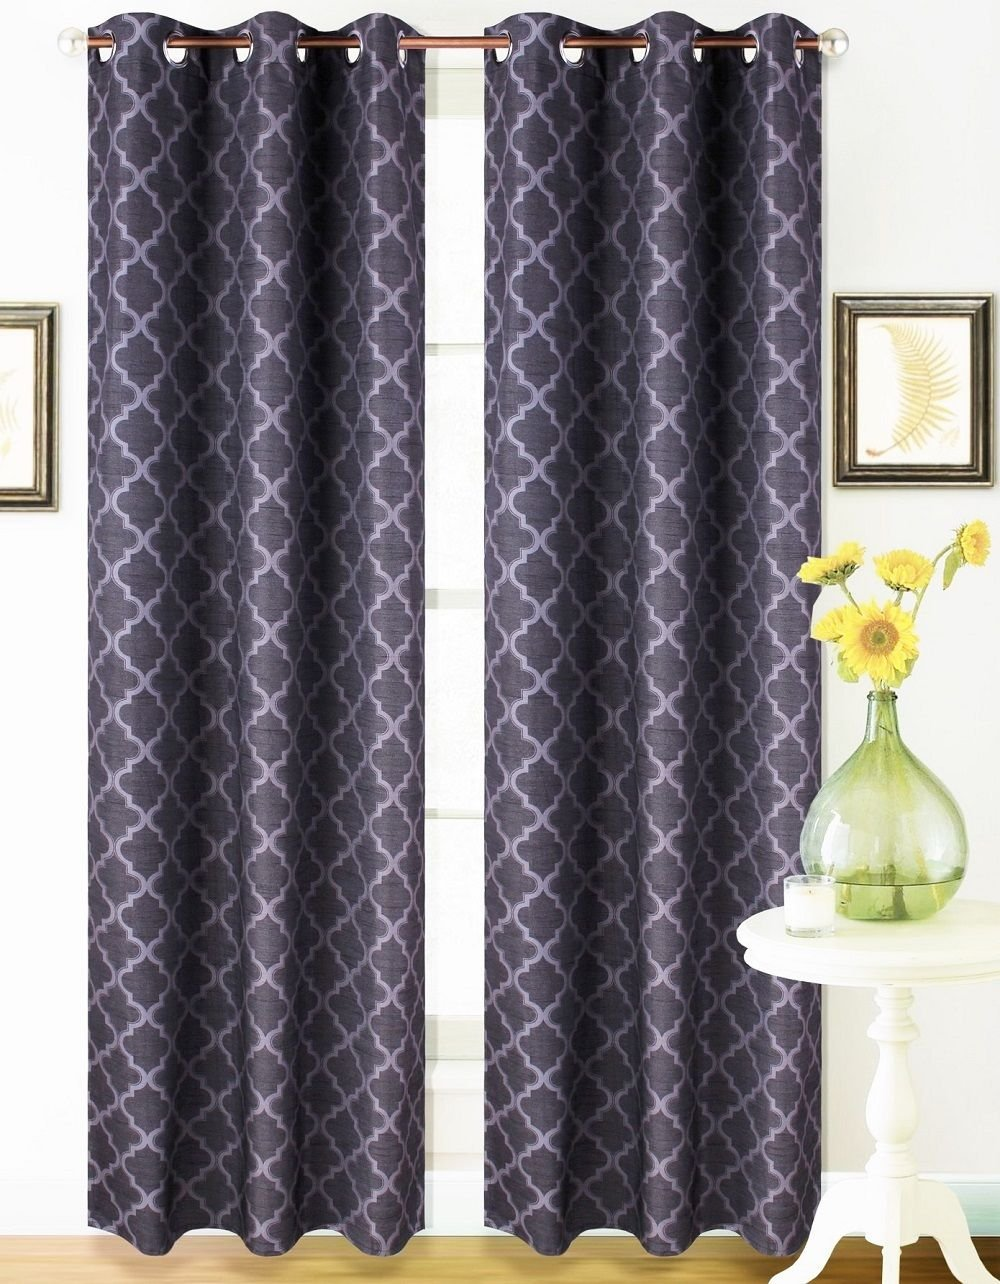 2 Panel Black Grey 95'' Geometric Lined Blackout Grommet Window Drape Curtain